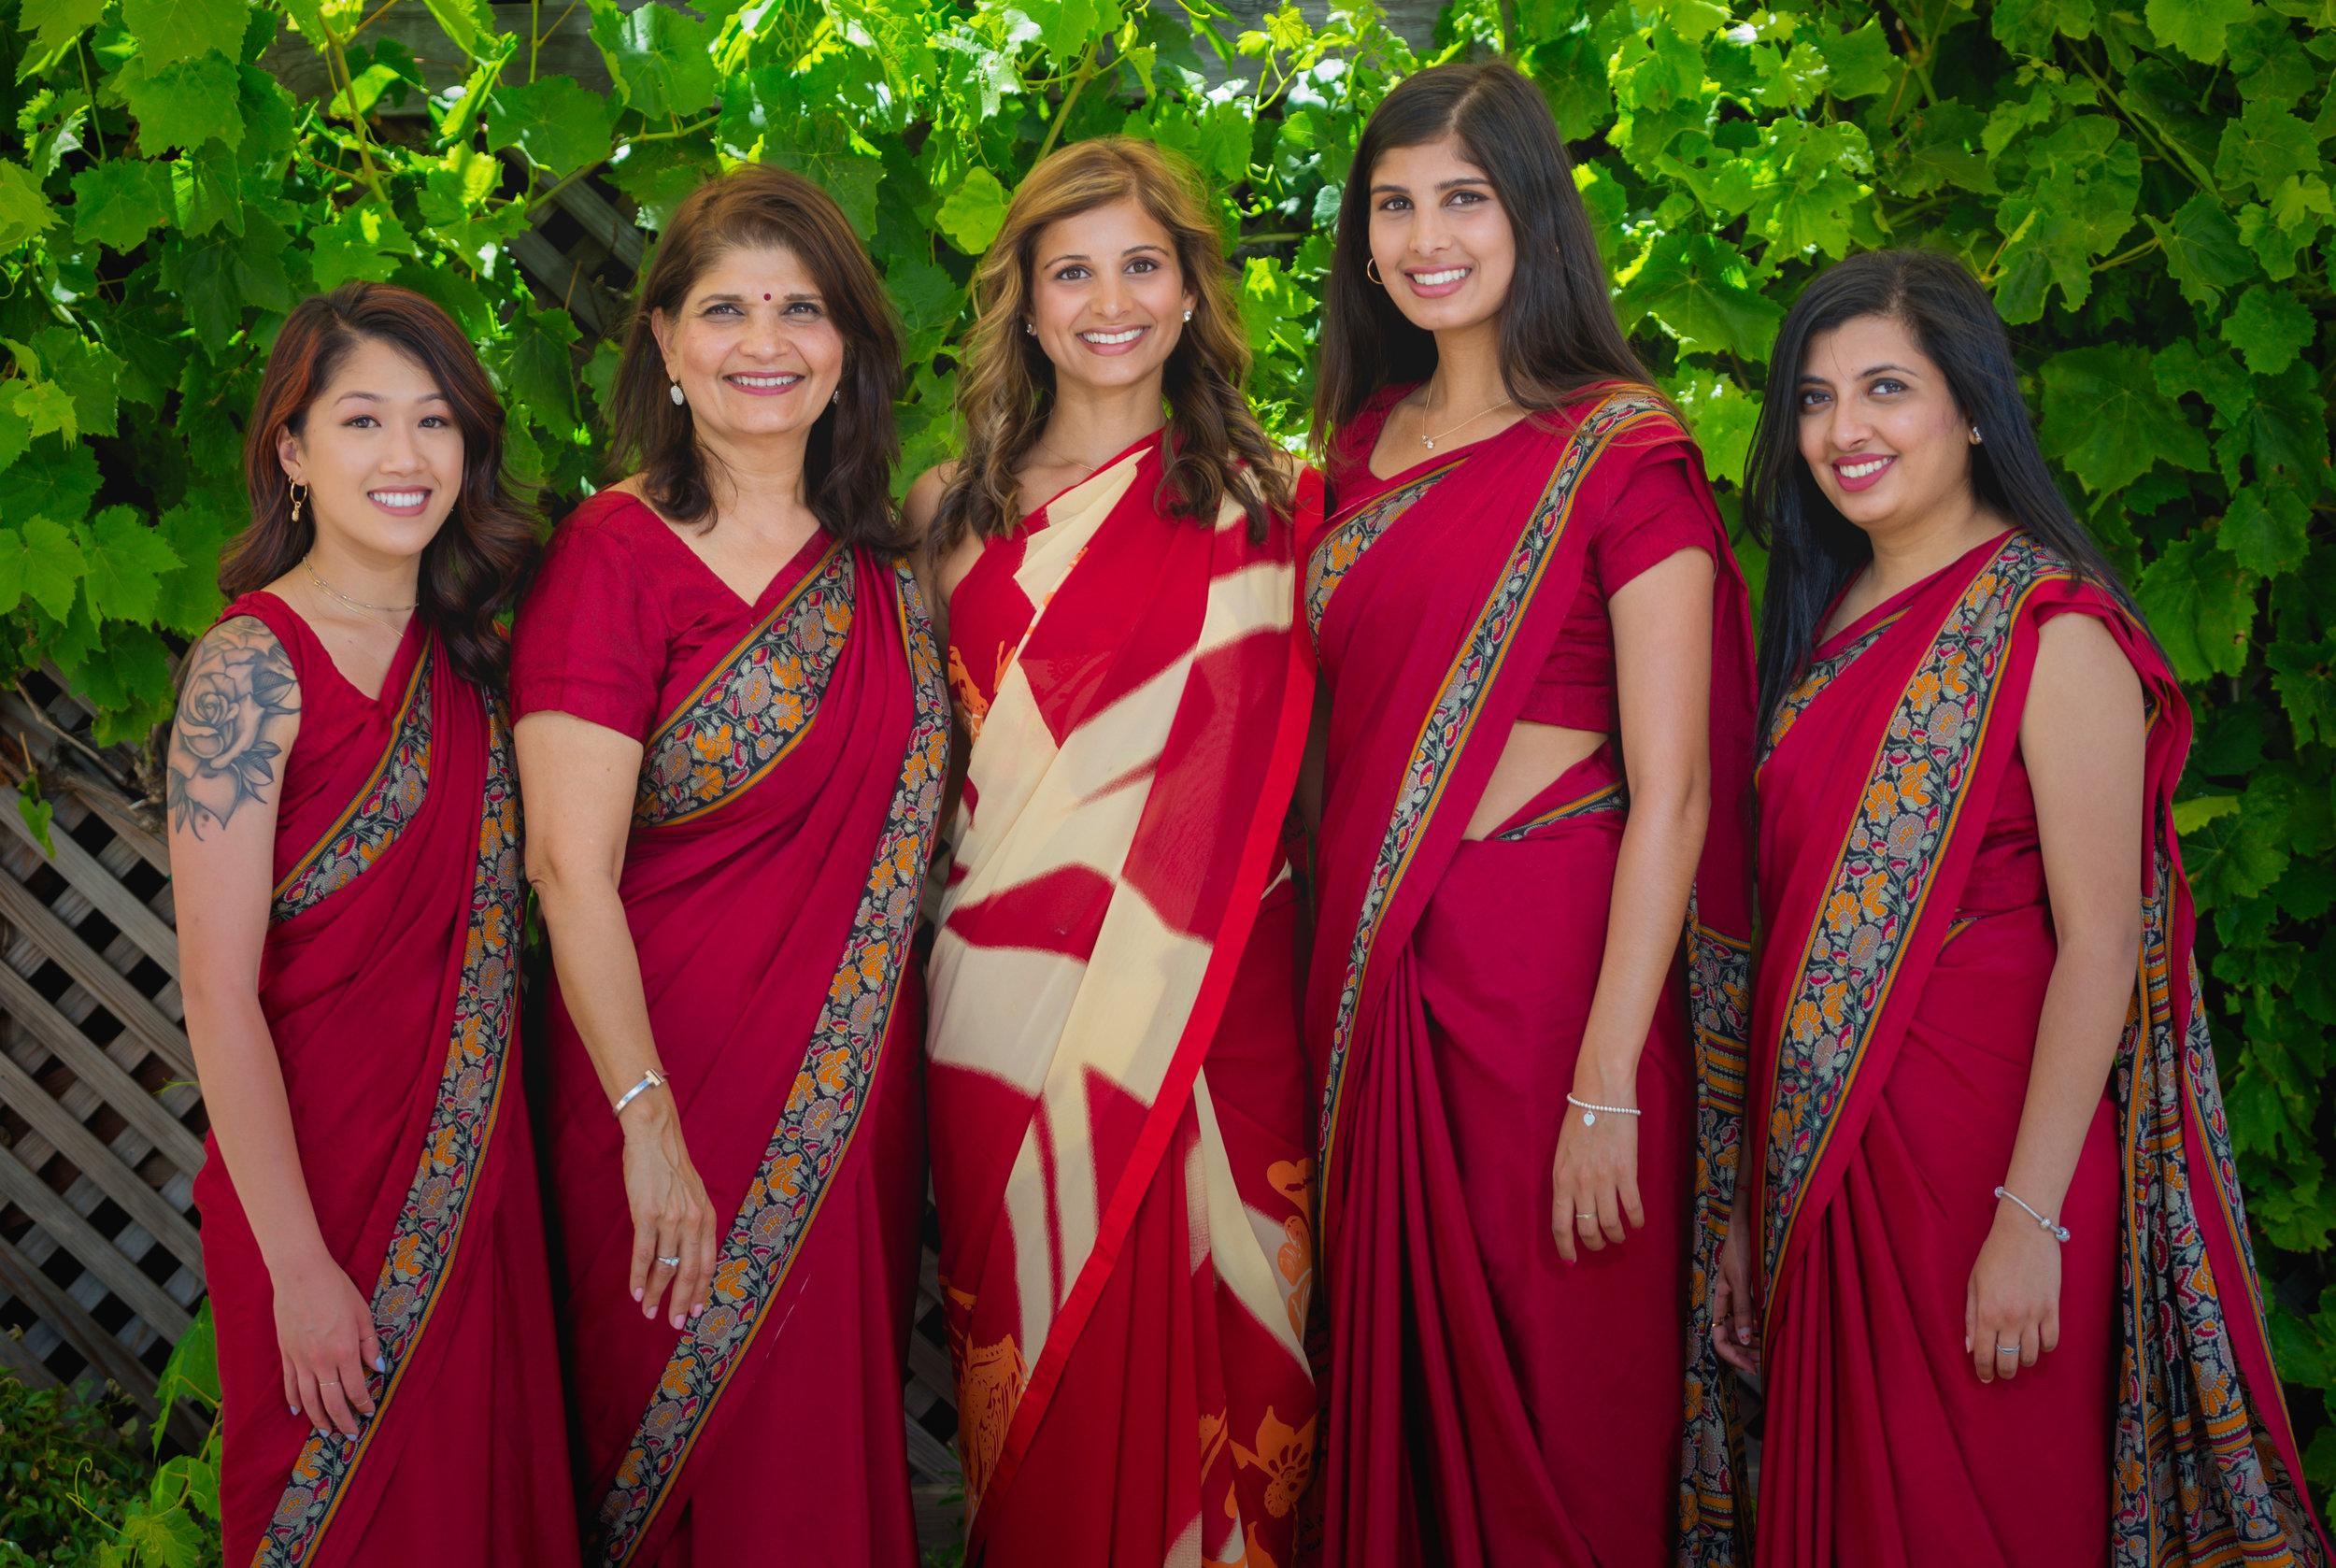 Vermilion Weddings & Events: San Francisco Bay Area's Best Wedding Planners